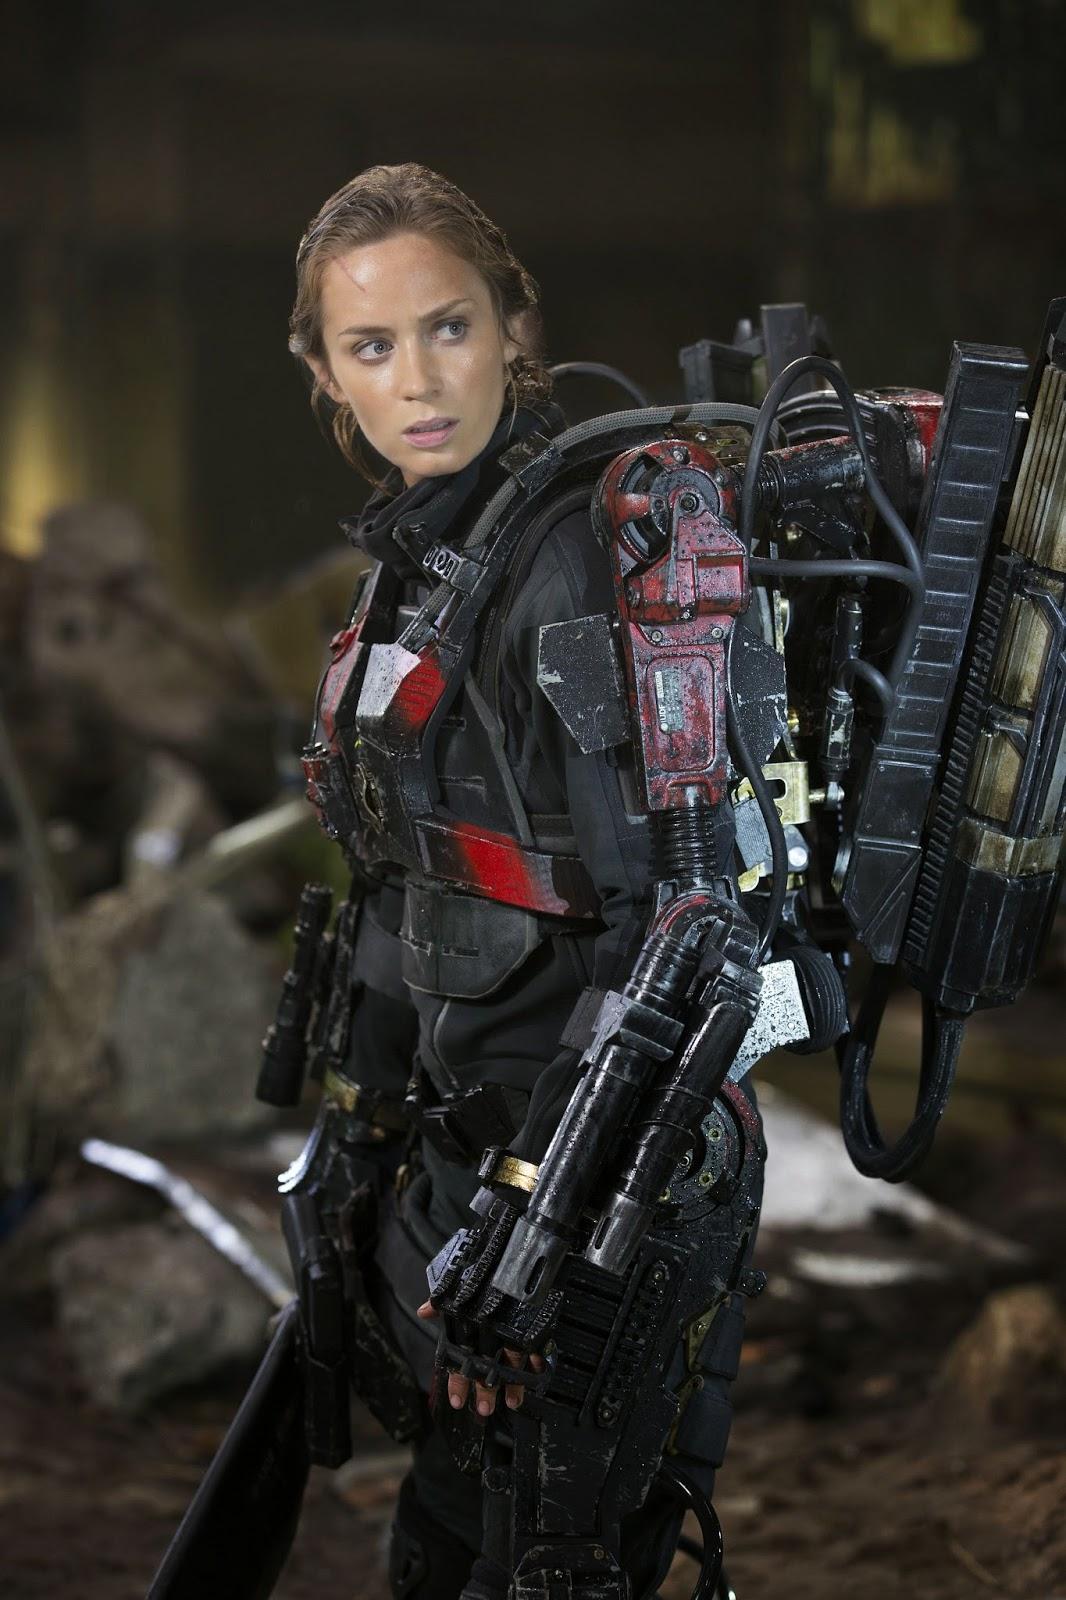 The Angel Of Verdun Emily Blunt As Rita Vrataski In Edge O Flickr